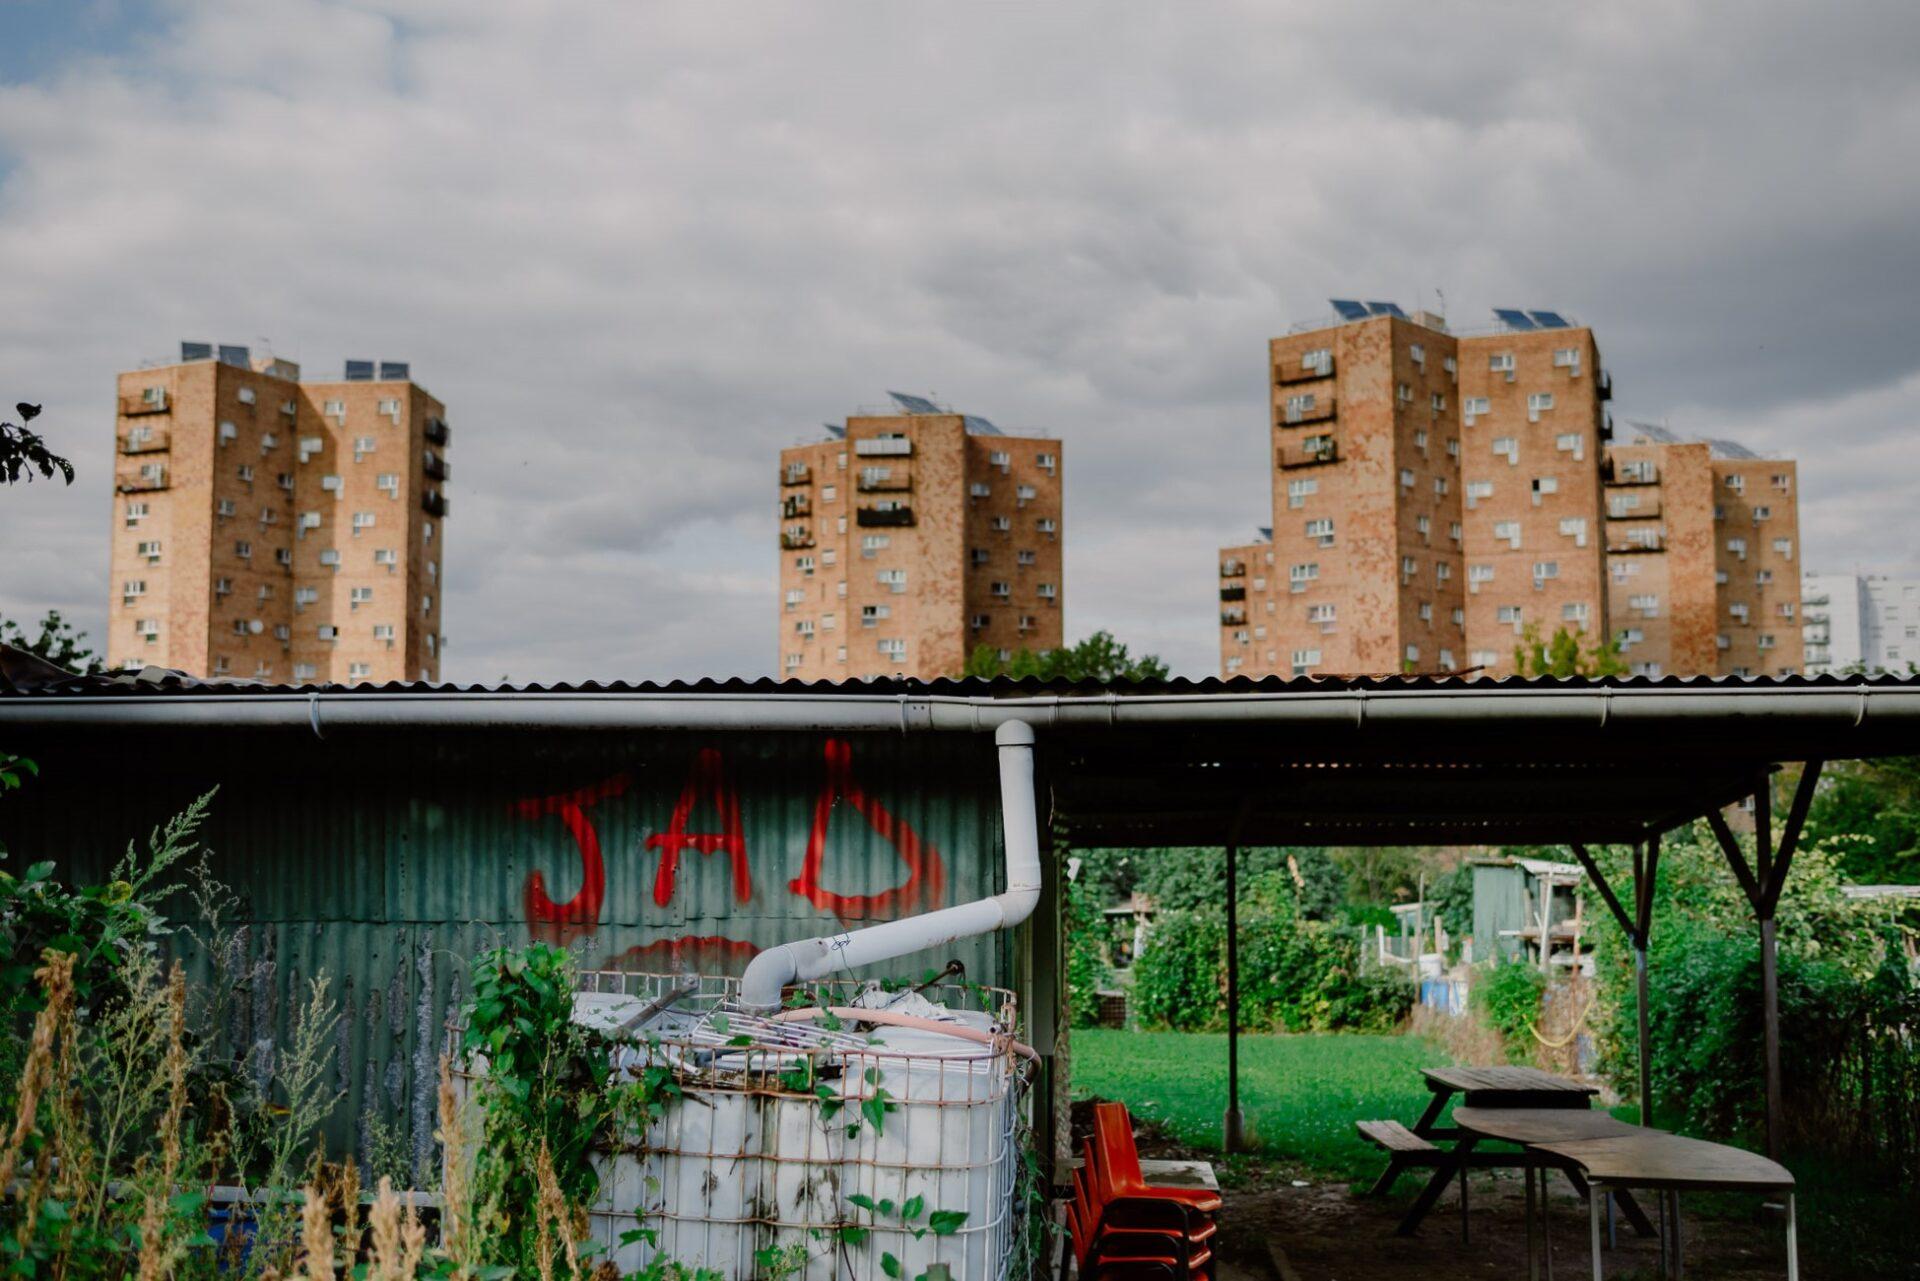 Jardins ouvriers aubervilliers 13 - Dagmara Bojenko - Eco-conscious Weddings, Births & Families